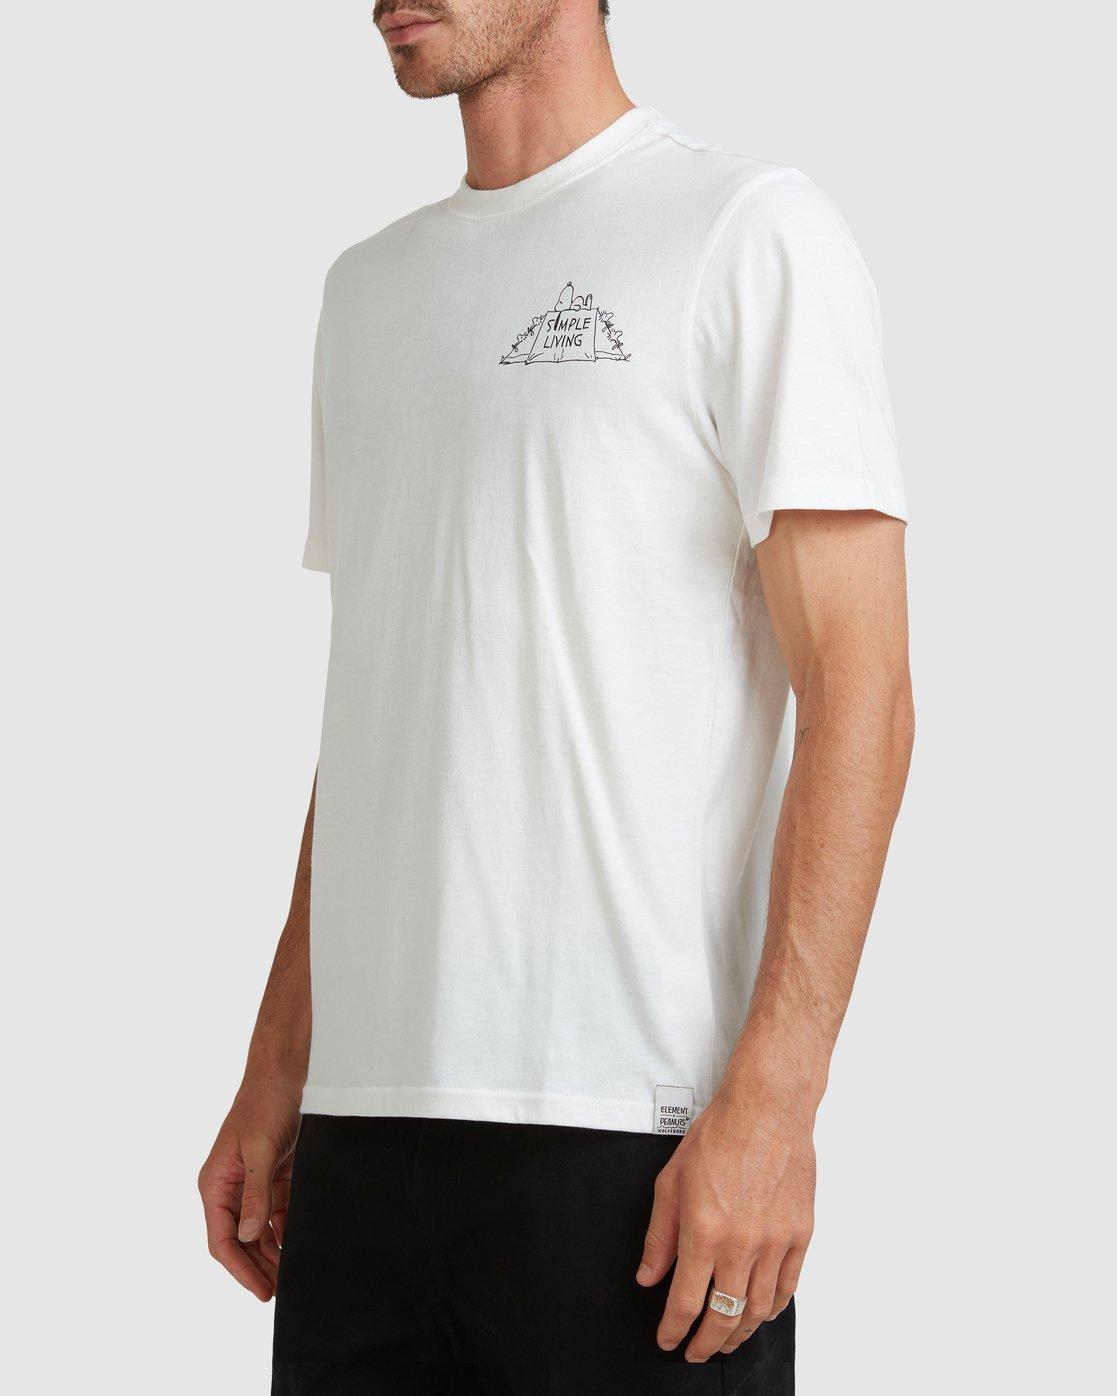 2 PEANUTS SIMPLE LIVING SHORT SLEEVE TEE White G517010 Element